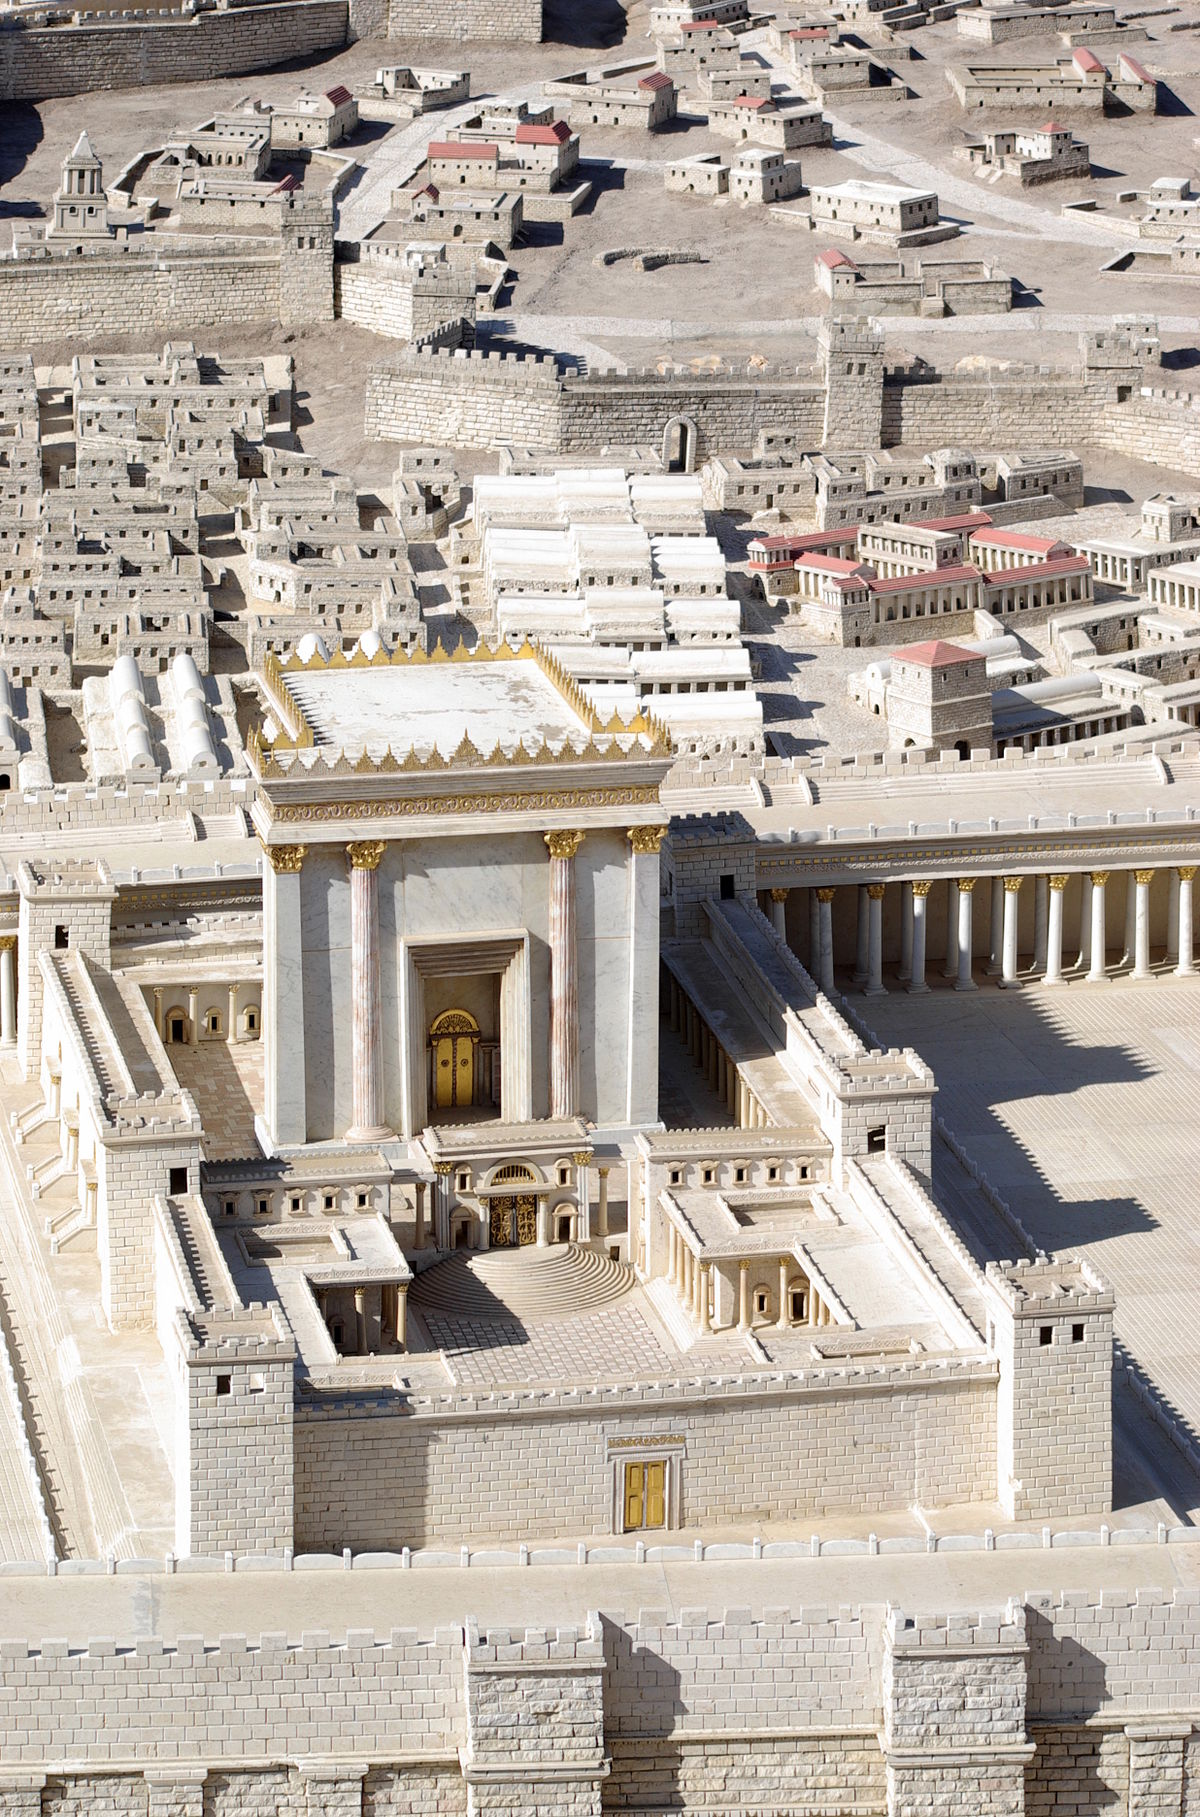 Temple in Jerusalem - Wikipedia